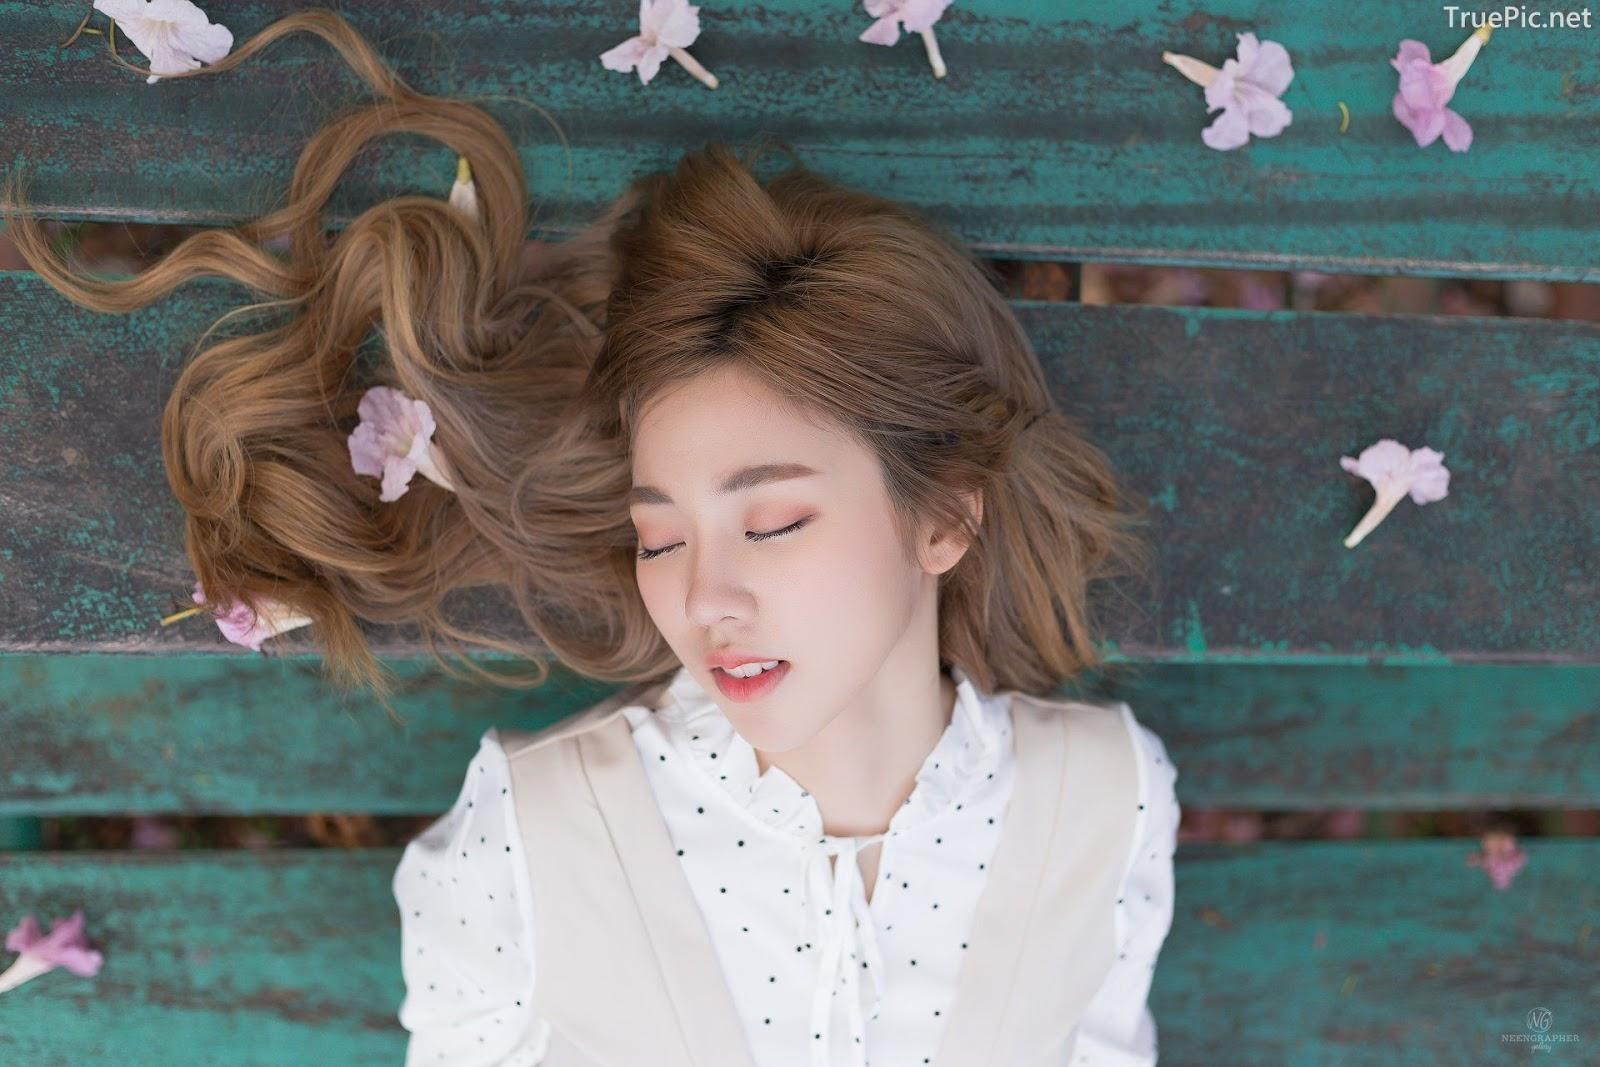 Thailand cute model Nilawan Iamchuasawad - Beautiful girl in the flower field - Photo by จิตรทิวัส จั่นระยับ - Picture 6